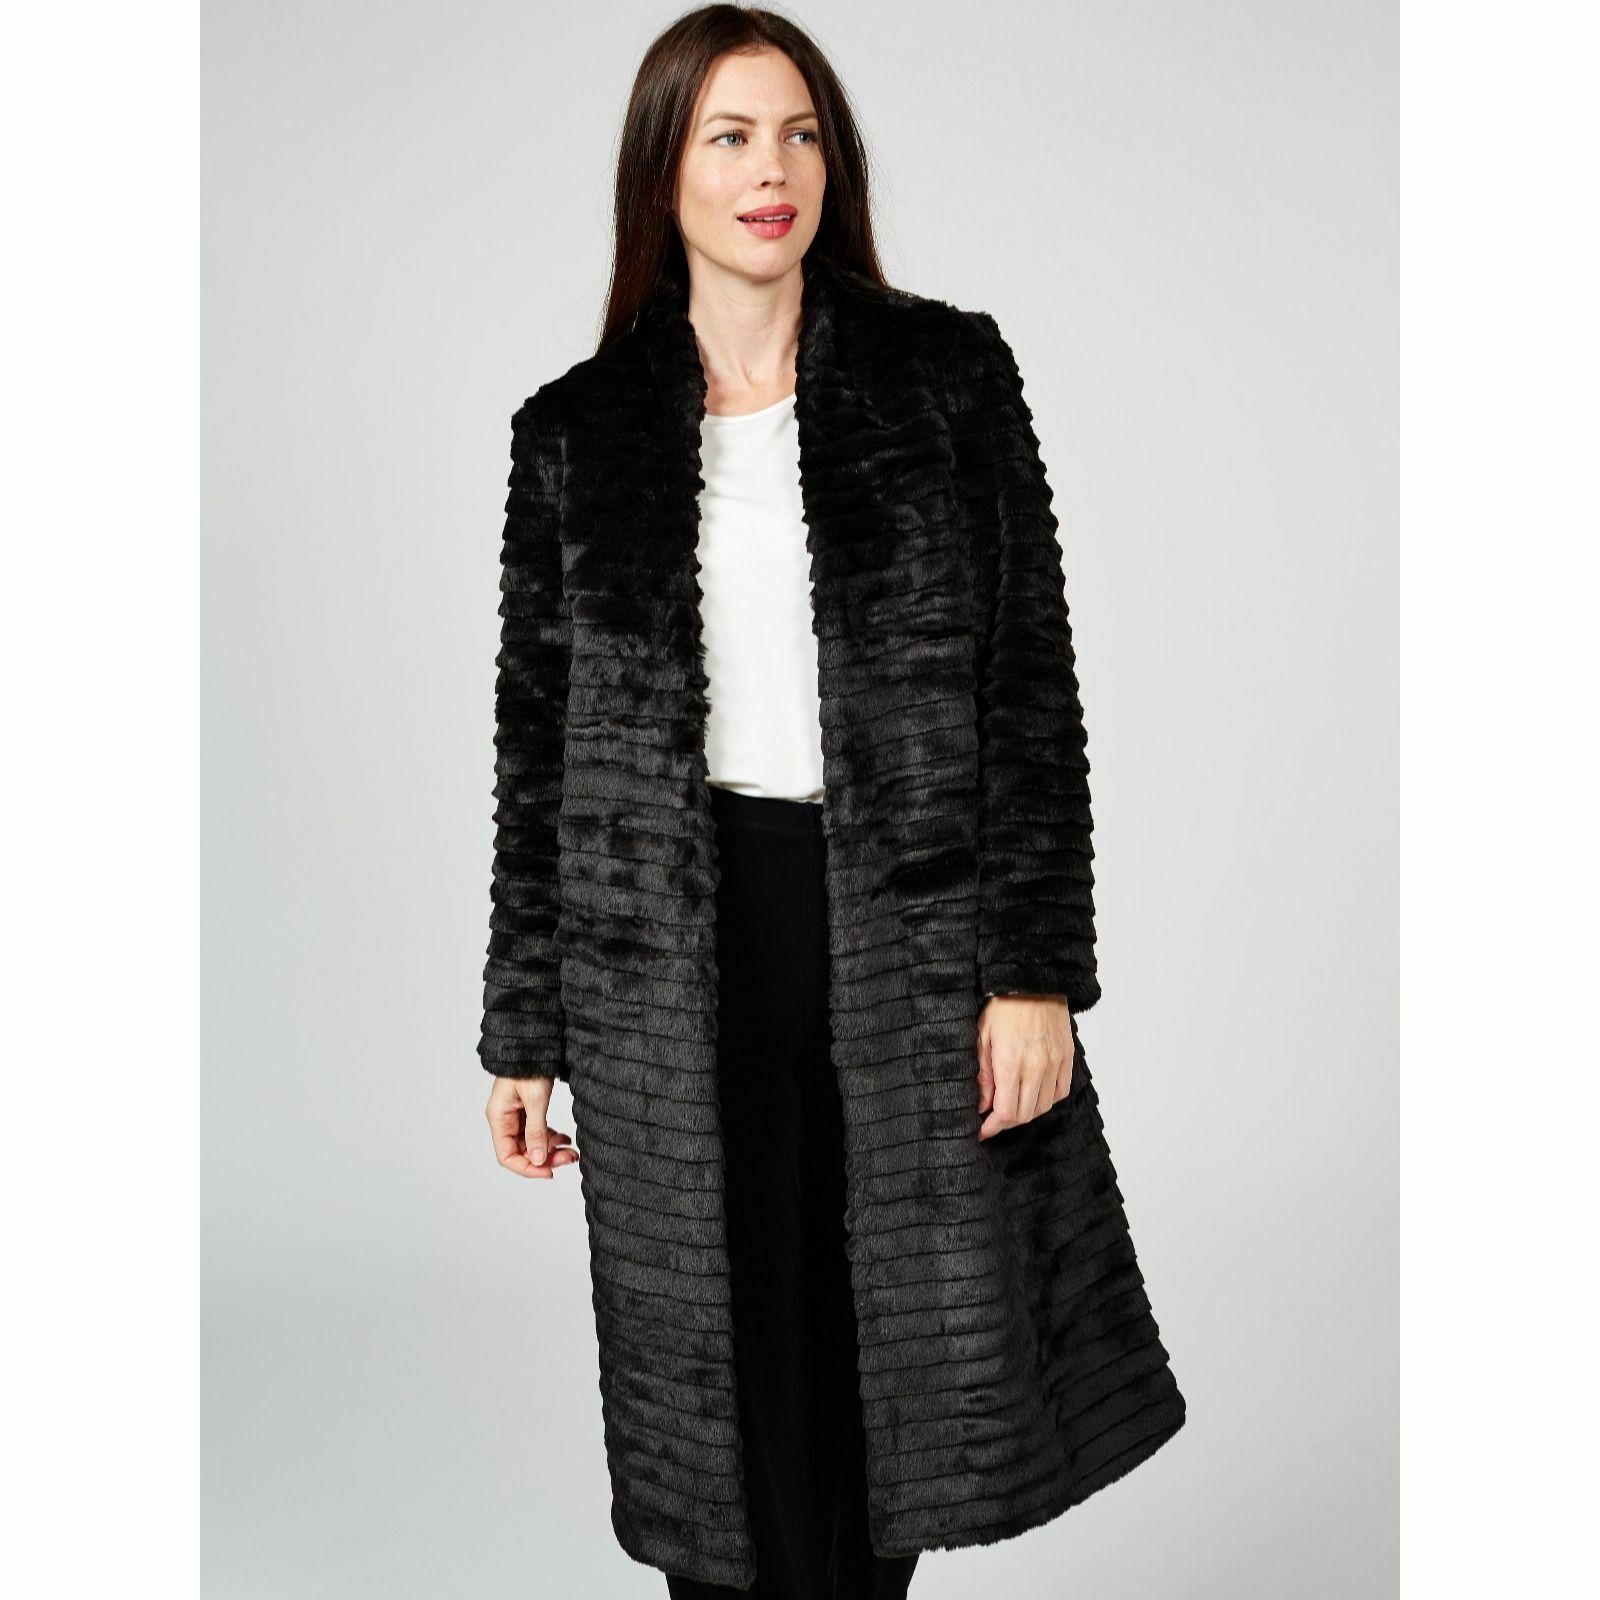 Black Helene Berman Faux Fur Edge to Edge Coat & Grey Contrast Lining -14 & BNWT